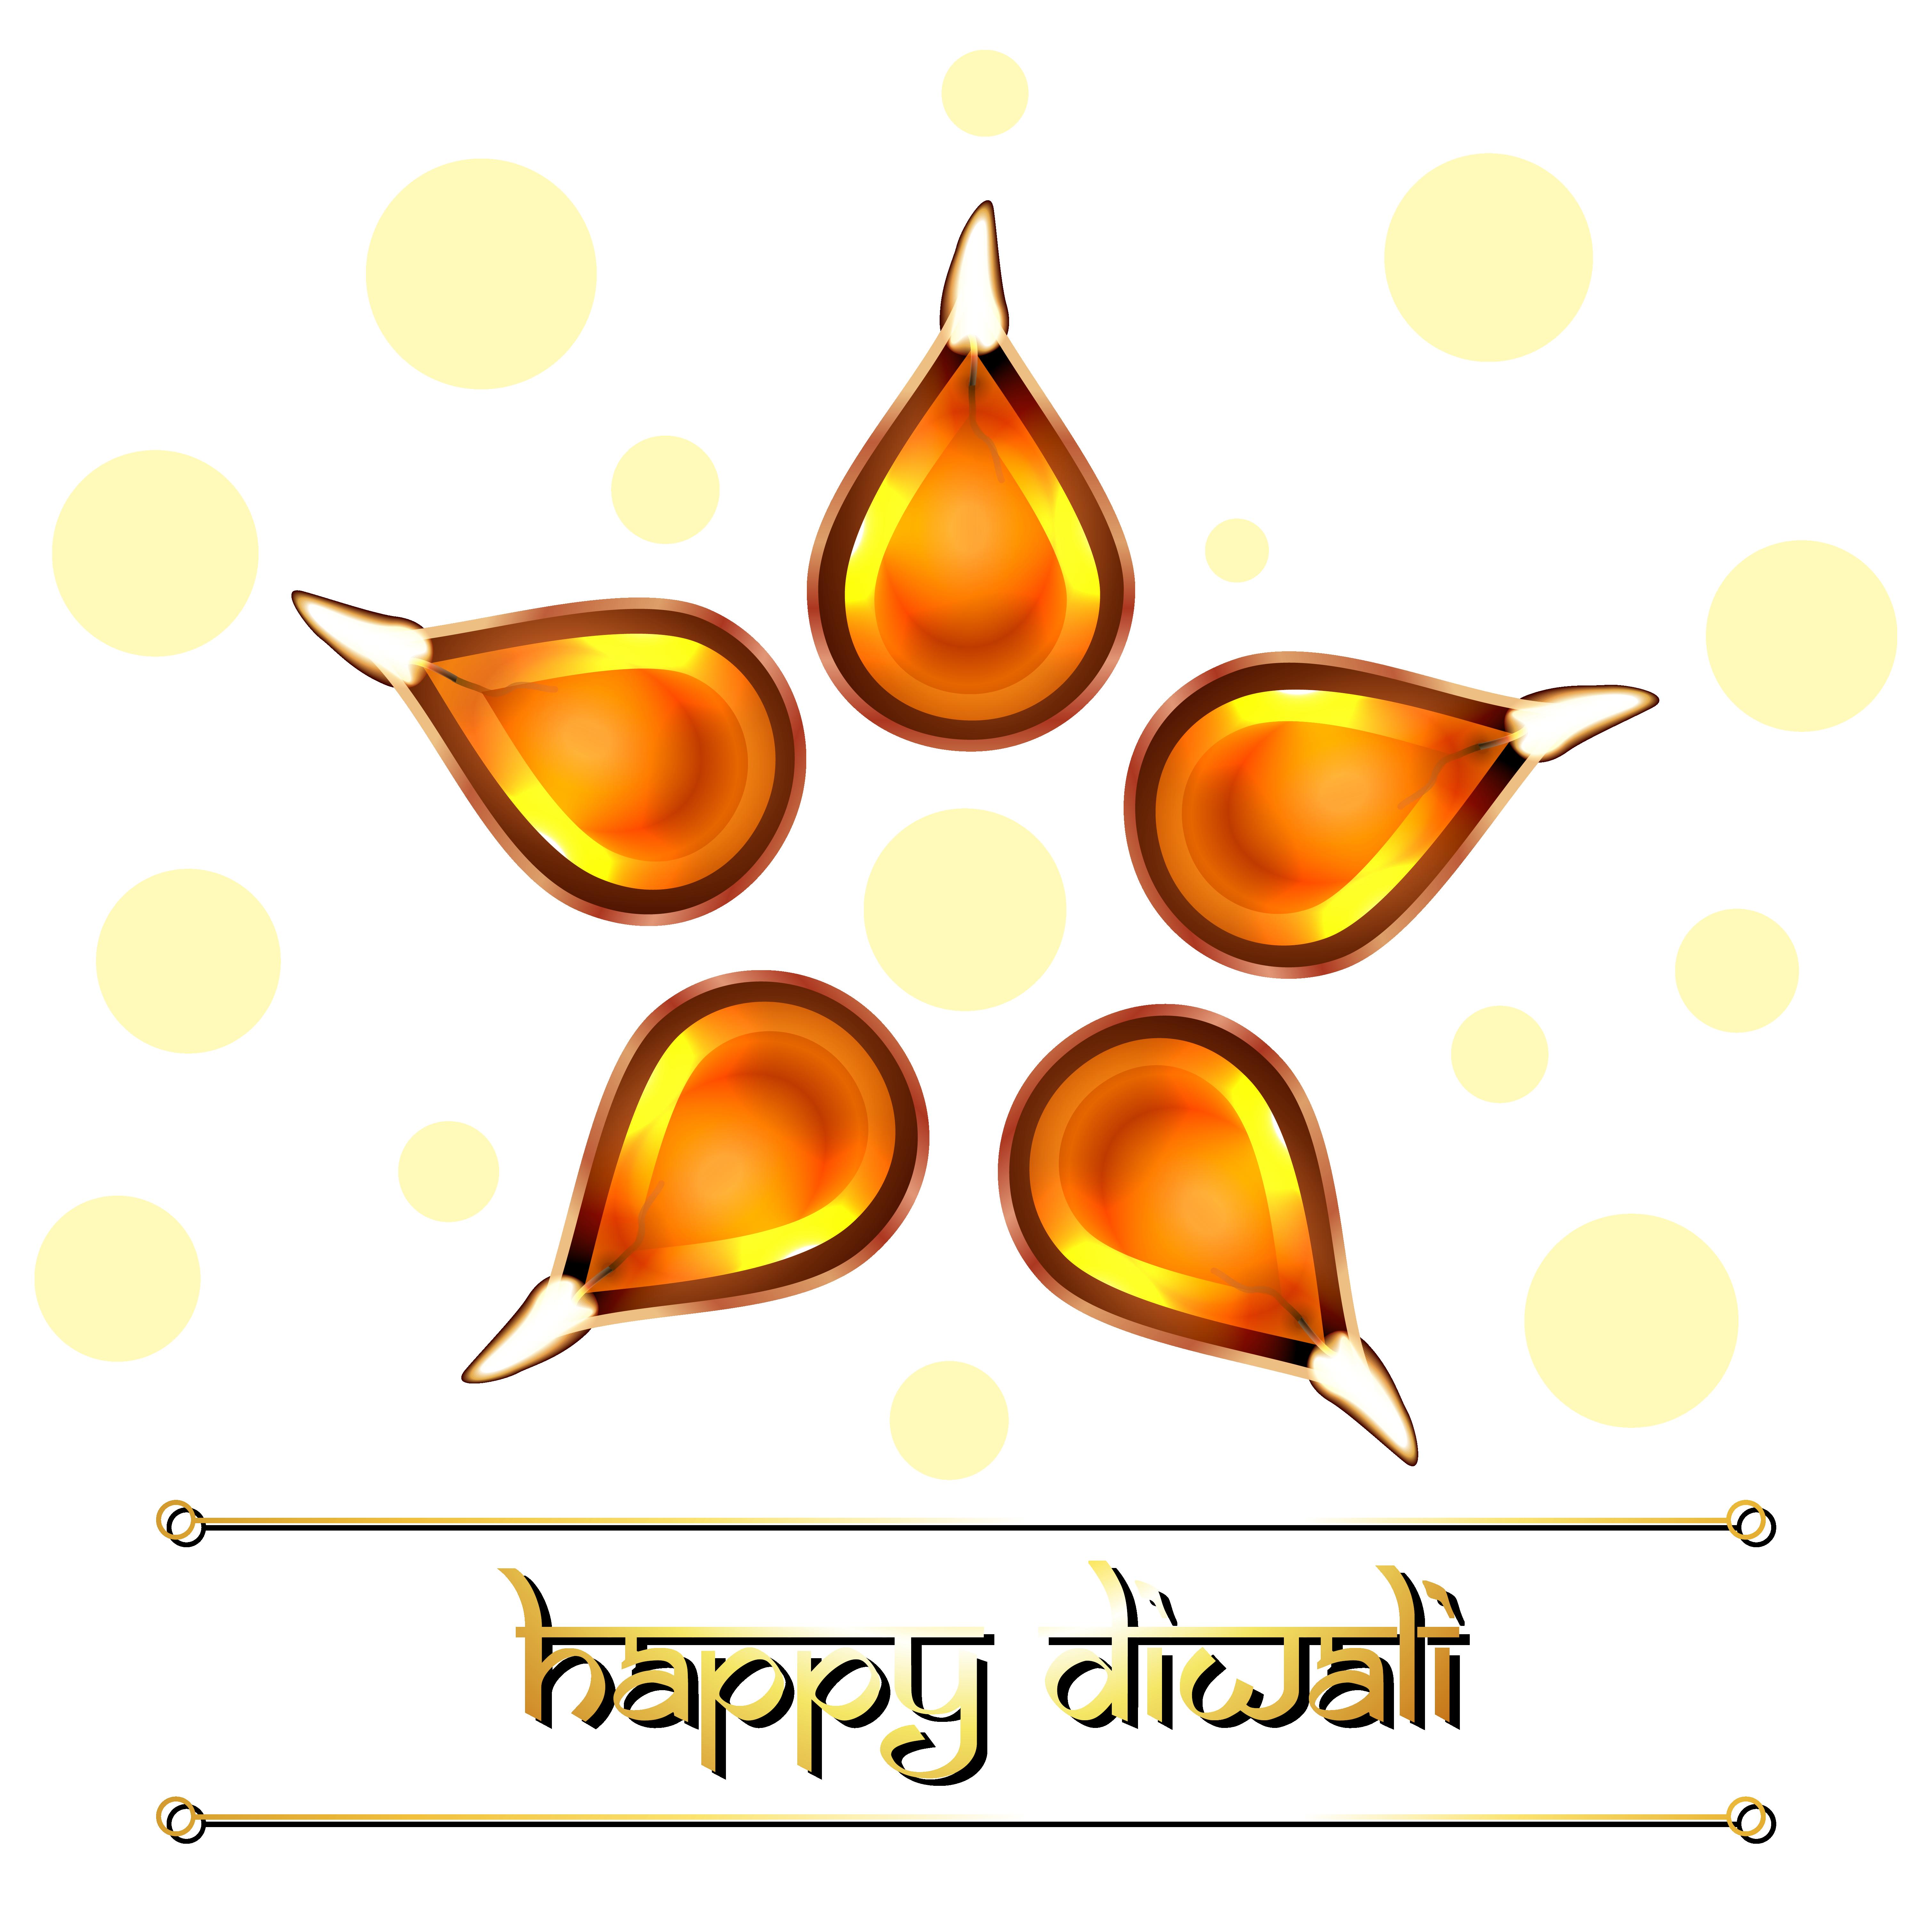 6020x6040 Beautiful Decoration Happy Diwali Png Clipart Imageu200b Gallery